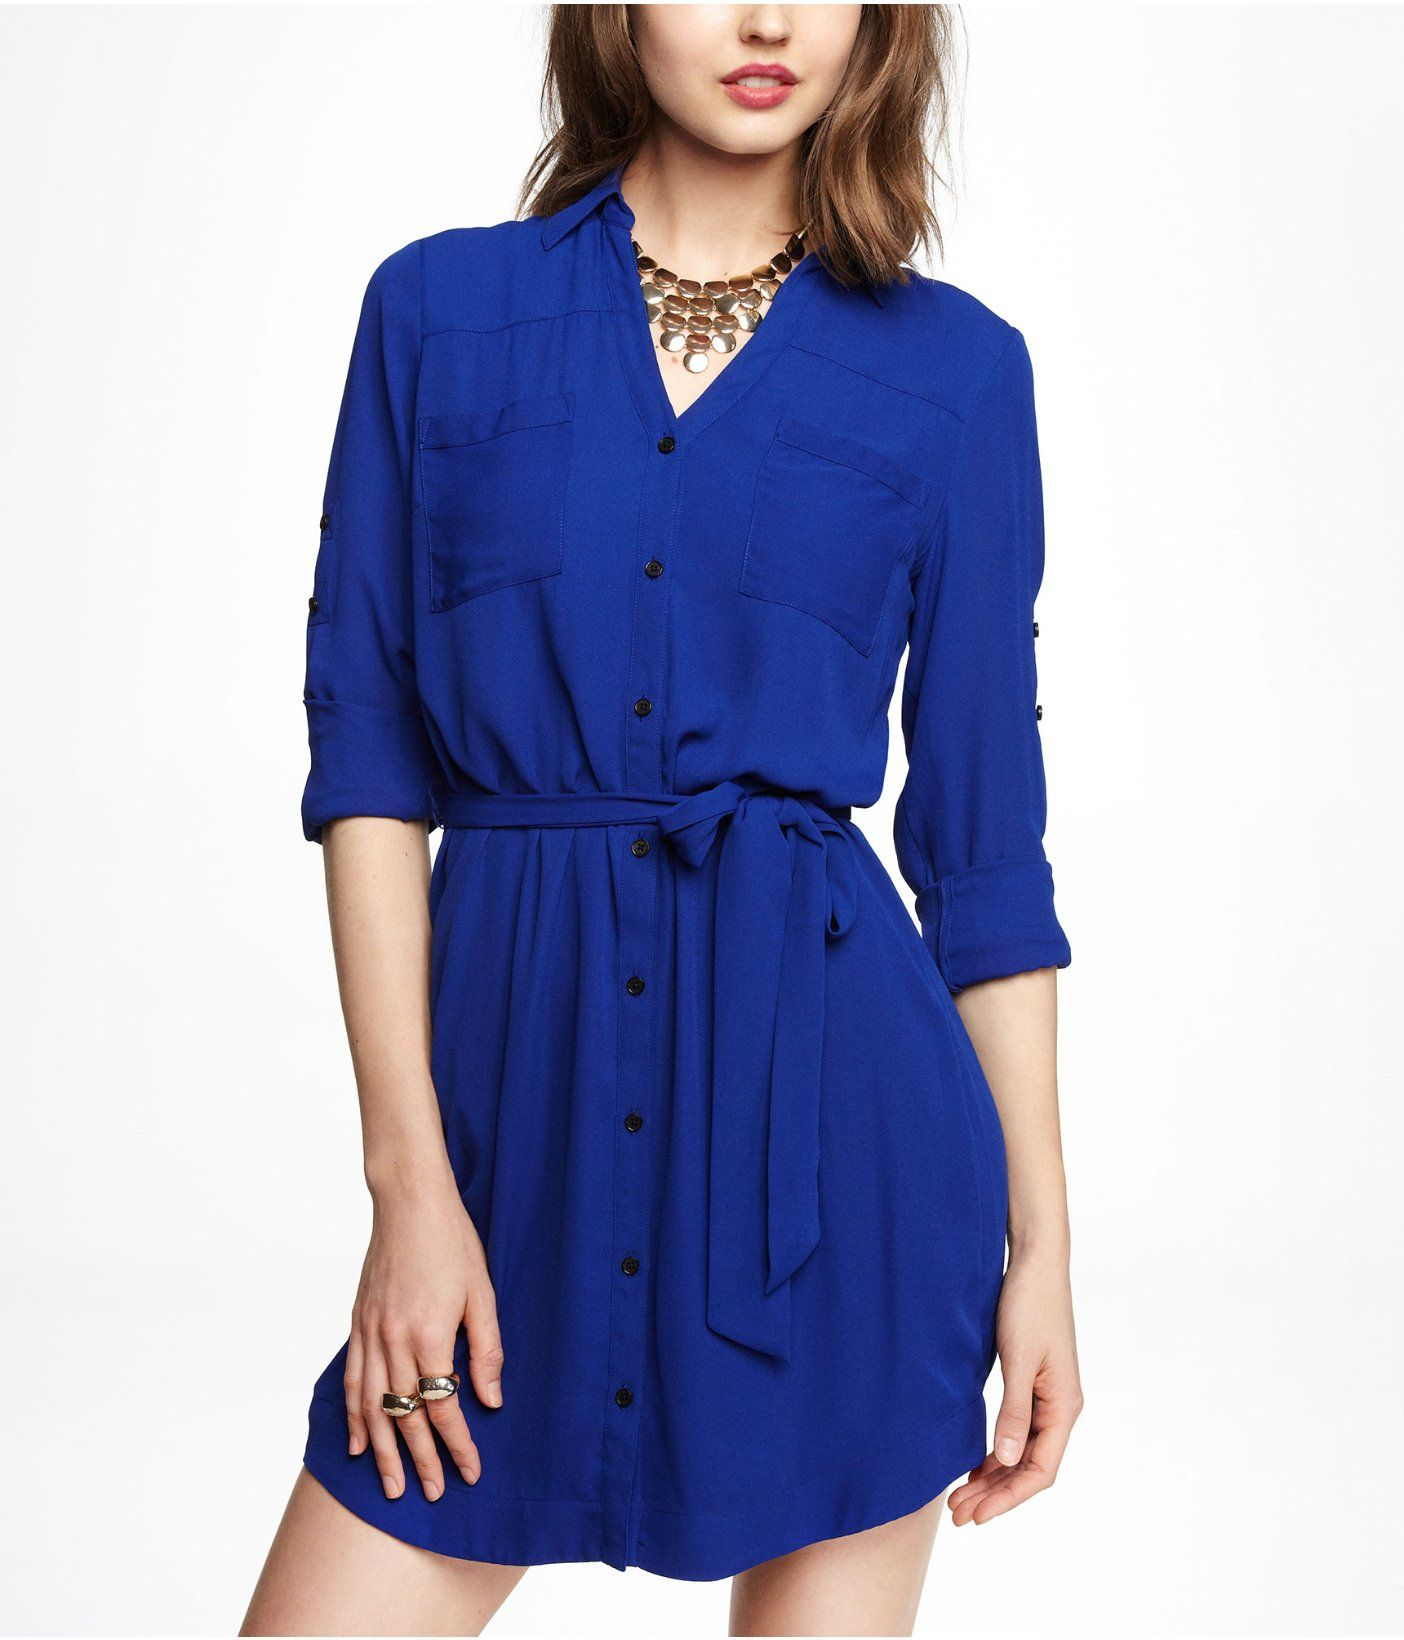 The dress express - The Portofino Shirt Dress In Fantasia Blue Express Dresses